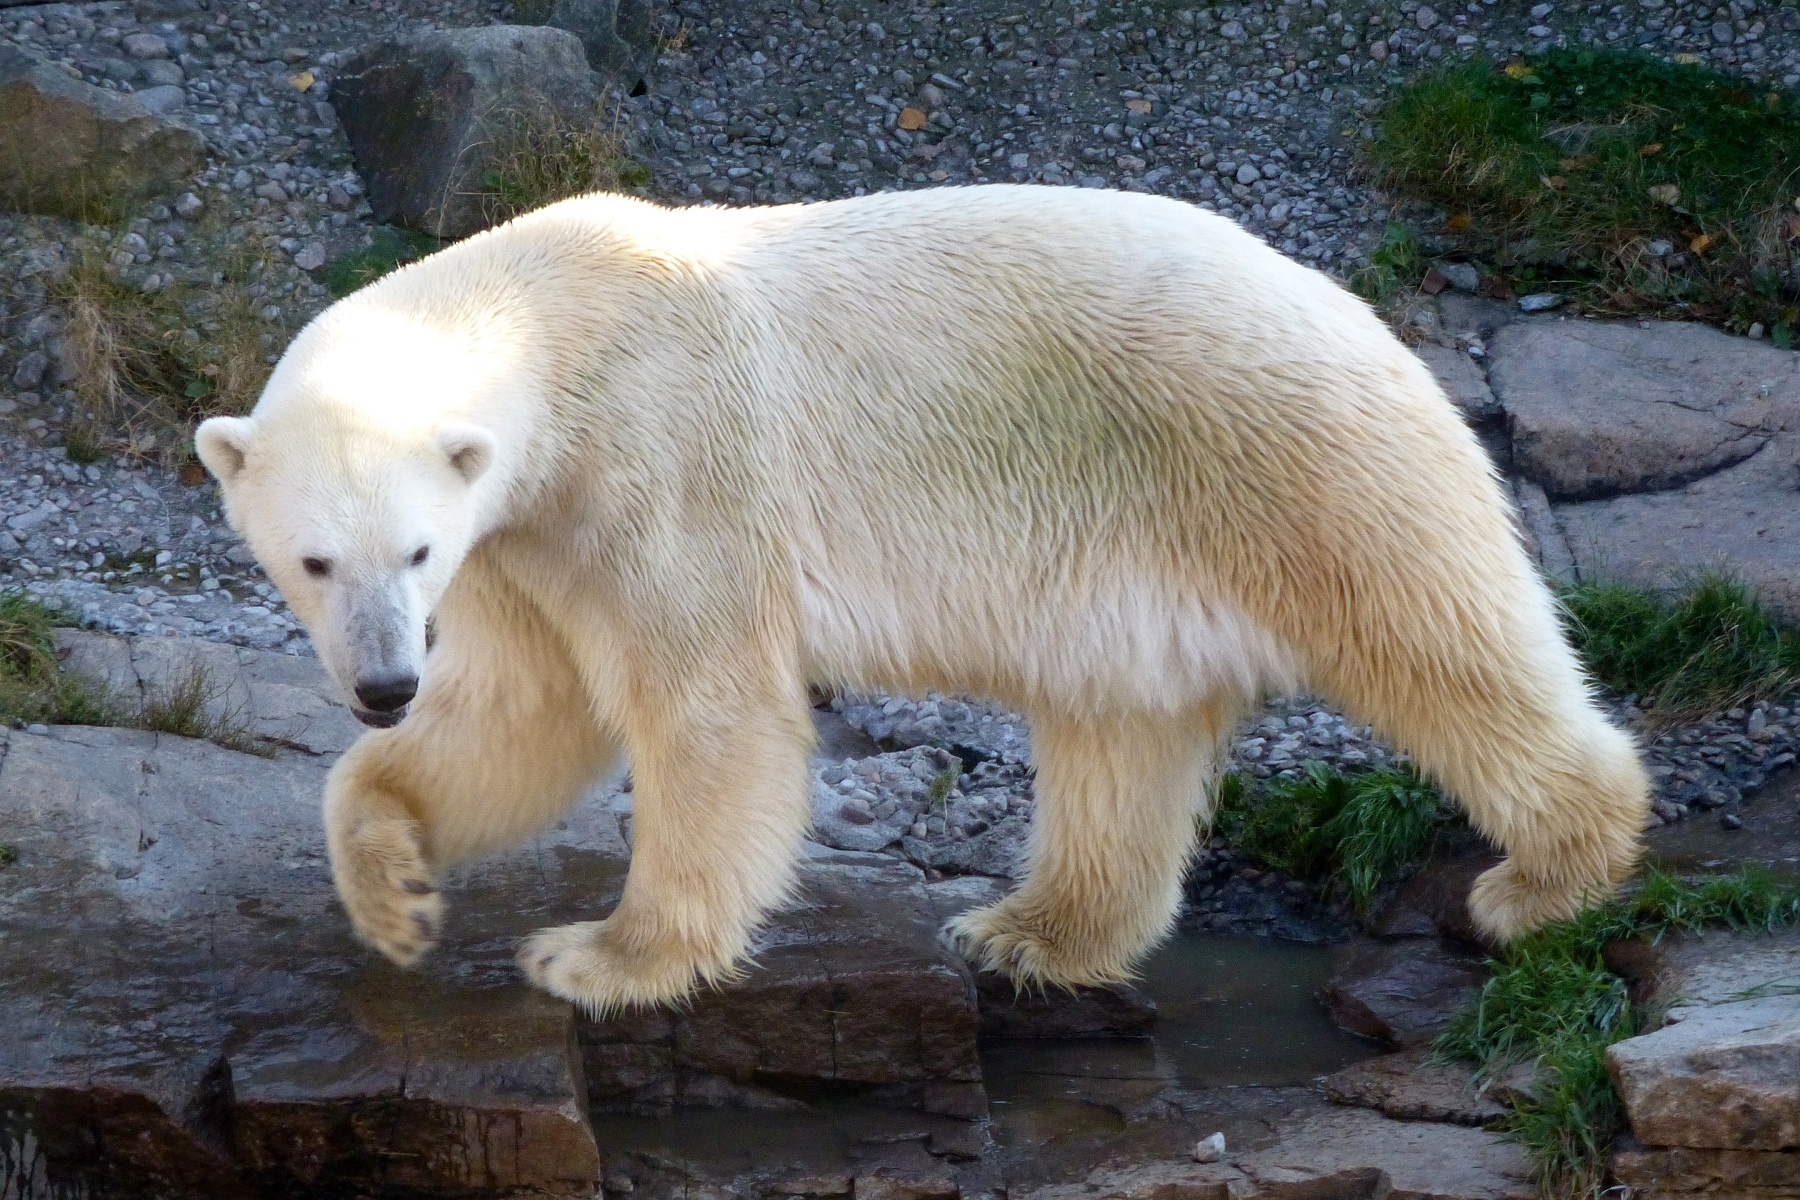 Zoo sauvage de Saint-Félicien - Québec